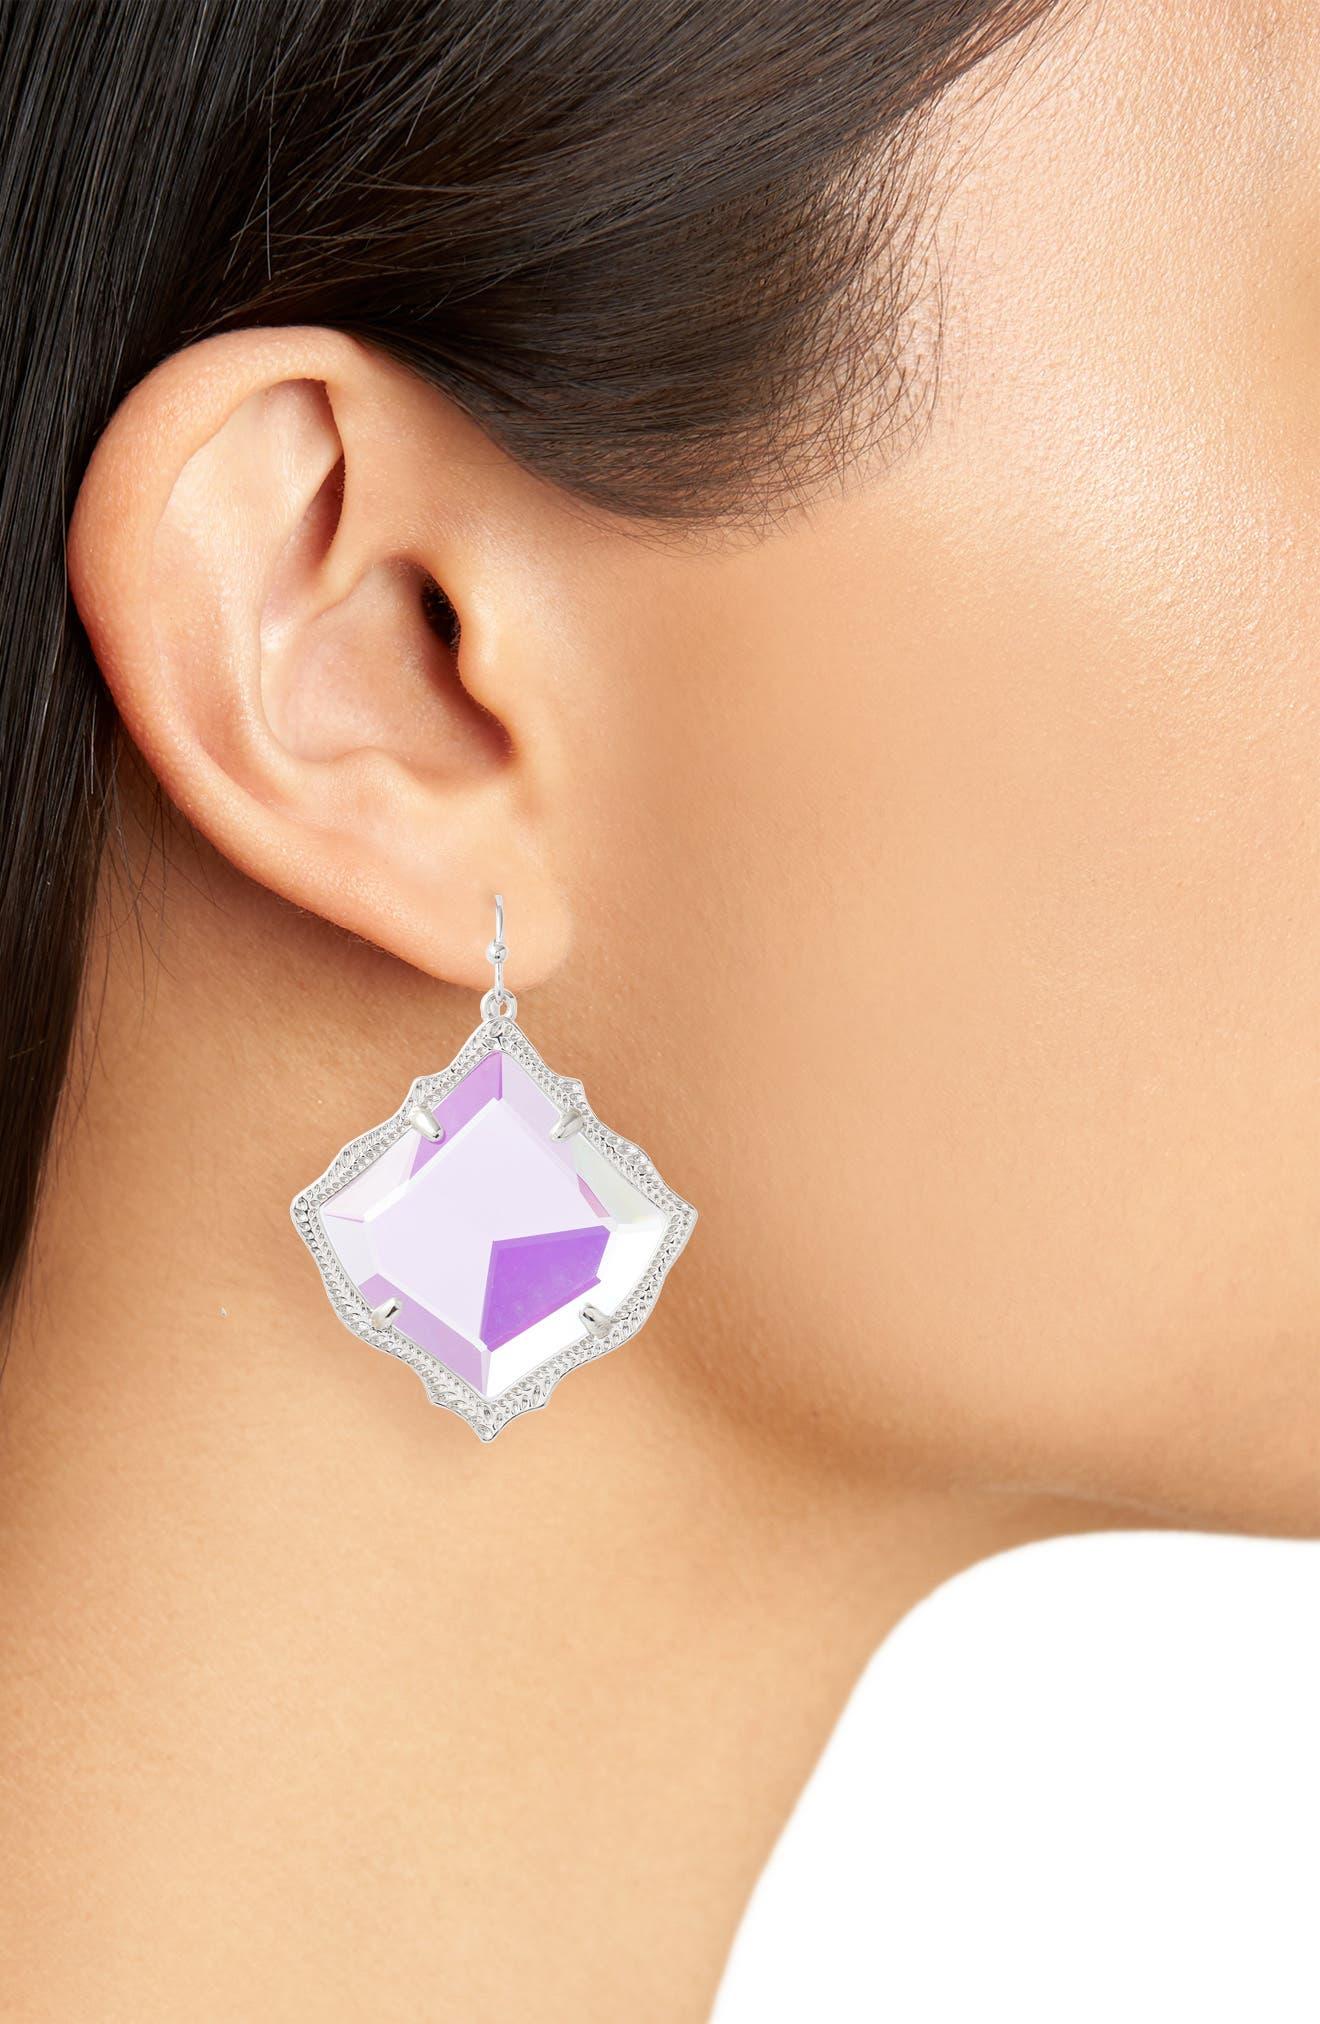 Kirsten Drop Earrings,                             Alternate thumbnail 2, color,                             DICHROIC GLASS/ SILVER